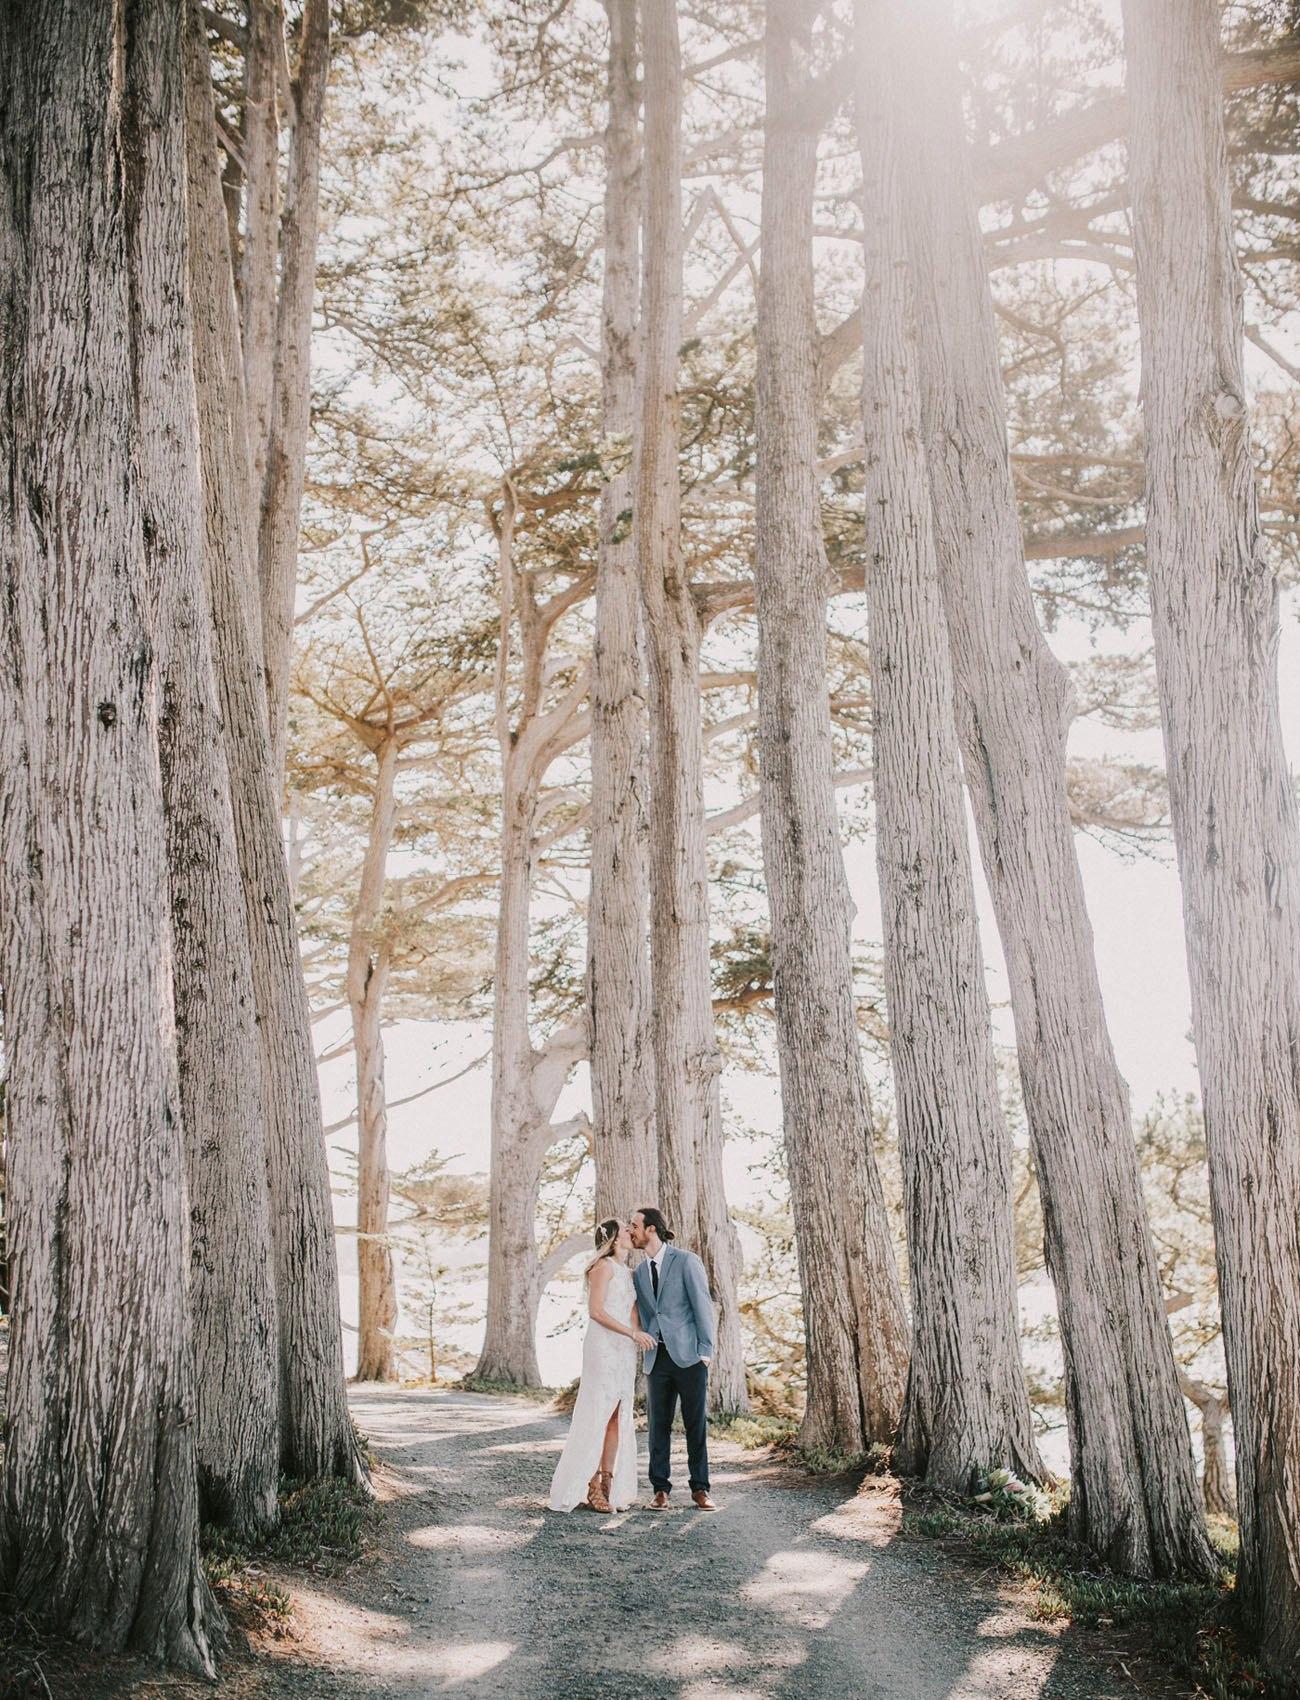 V1 yt Fj4aE - Свадьба в заповедном лесу на берегу океана (26 фото)